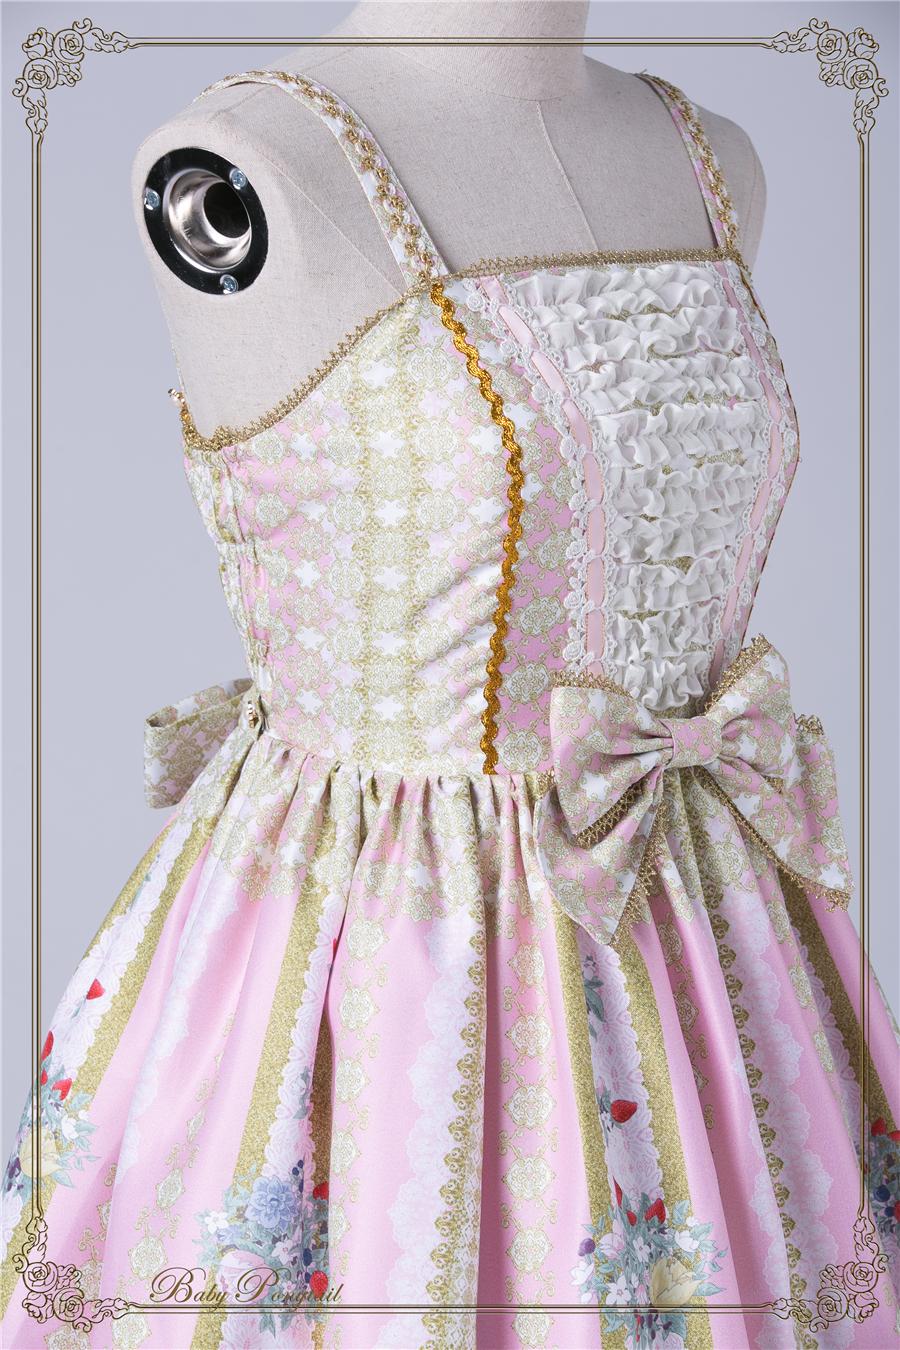 Baby Ponytail_Stock Photo_Rococo Bouquet_JSK Pink_4.jpg